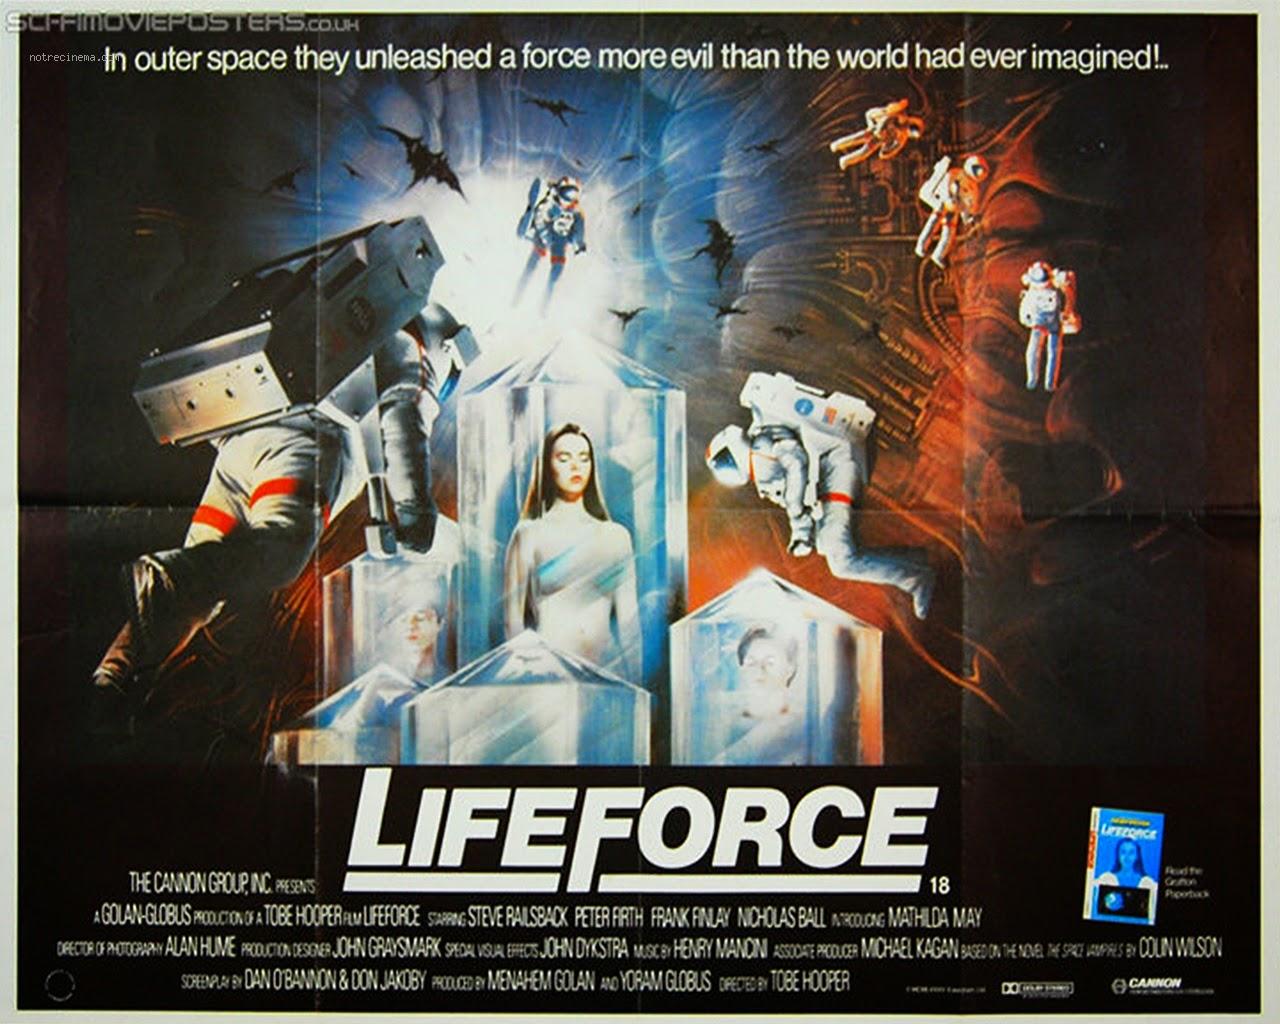 film lifeforce